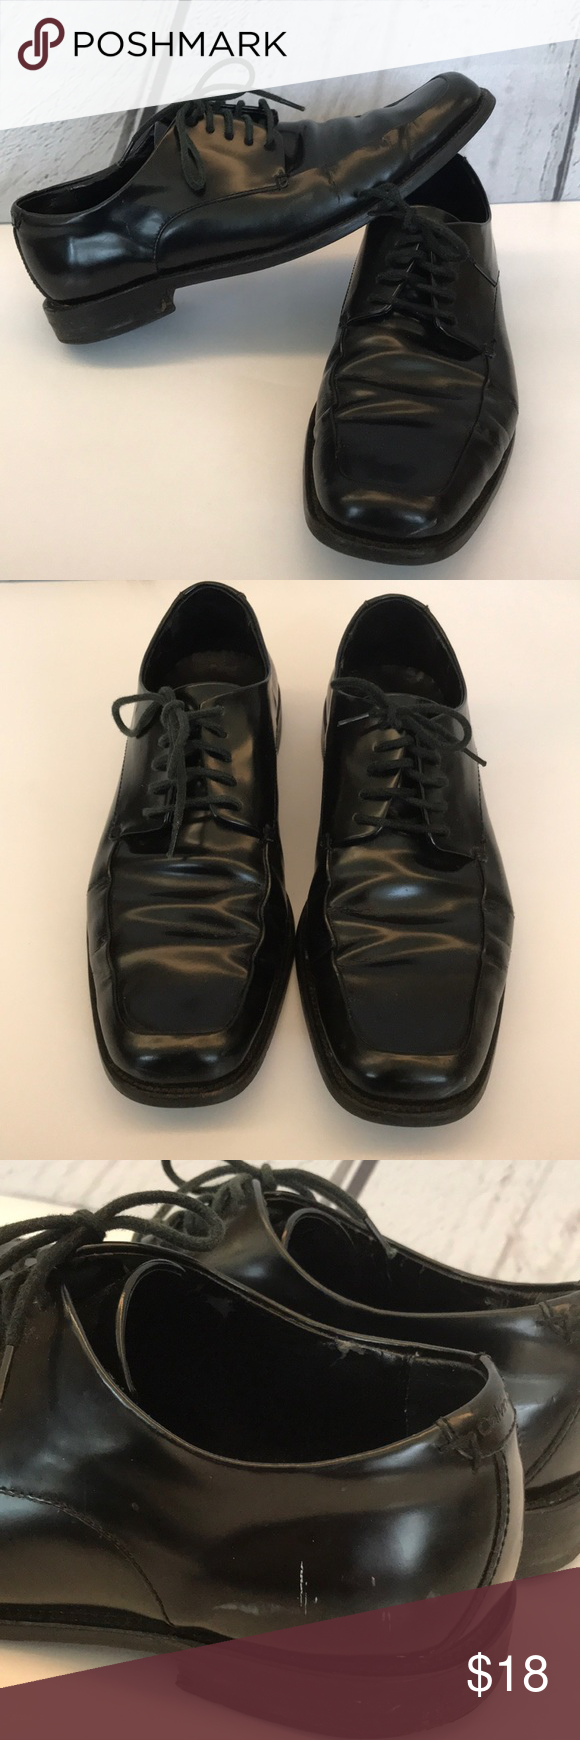 Pimlico Black Www Cooganlondon Com Http Www Cooganlondon Com Smart Casual Shoes Html Dress Shoes Men Black Brogues Mens Casual Shoes [ 1600 x 1600 Pixel ]